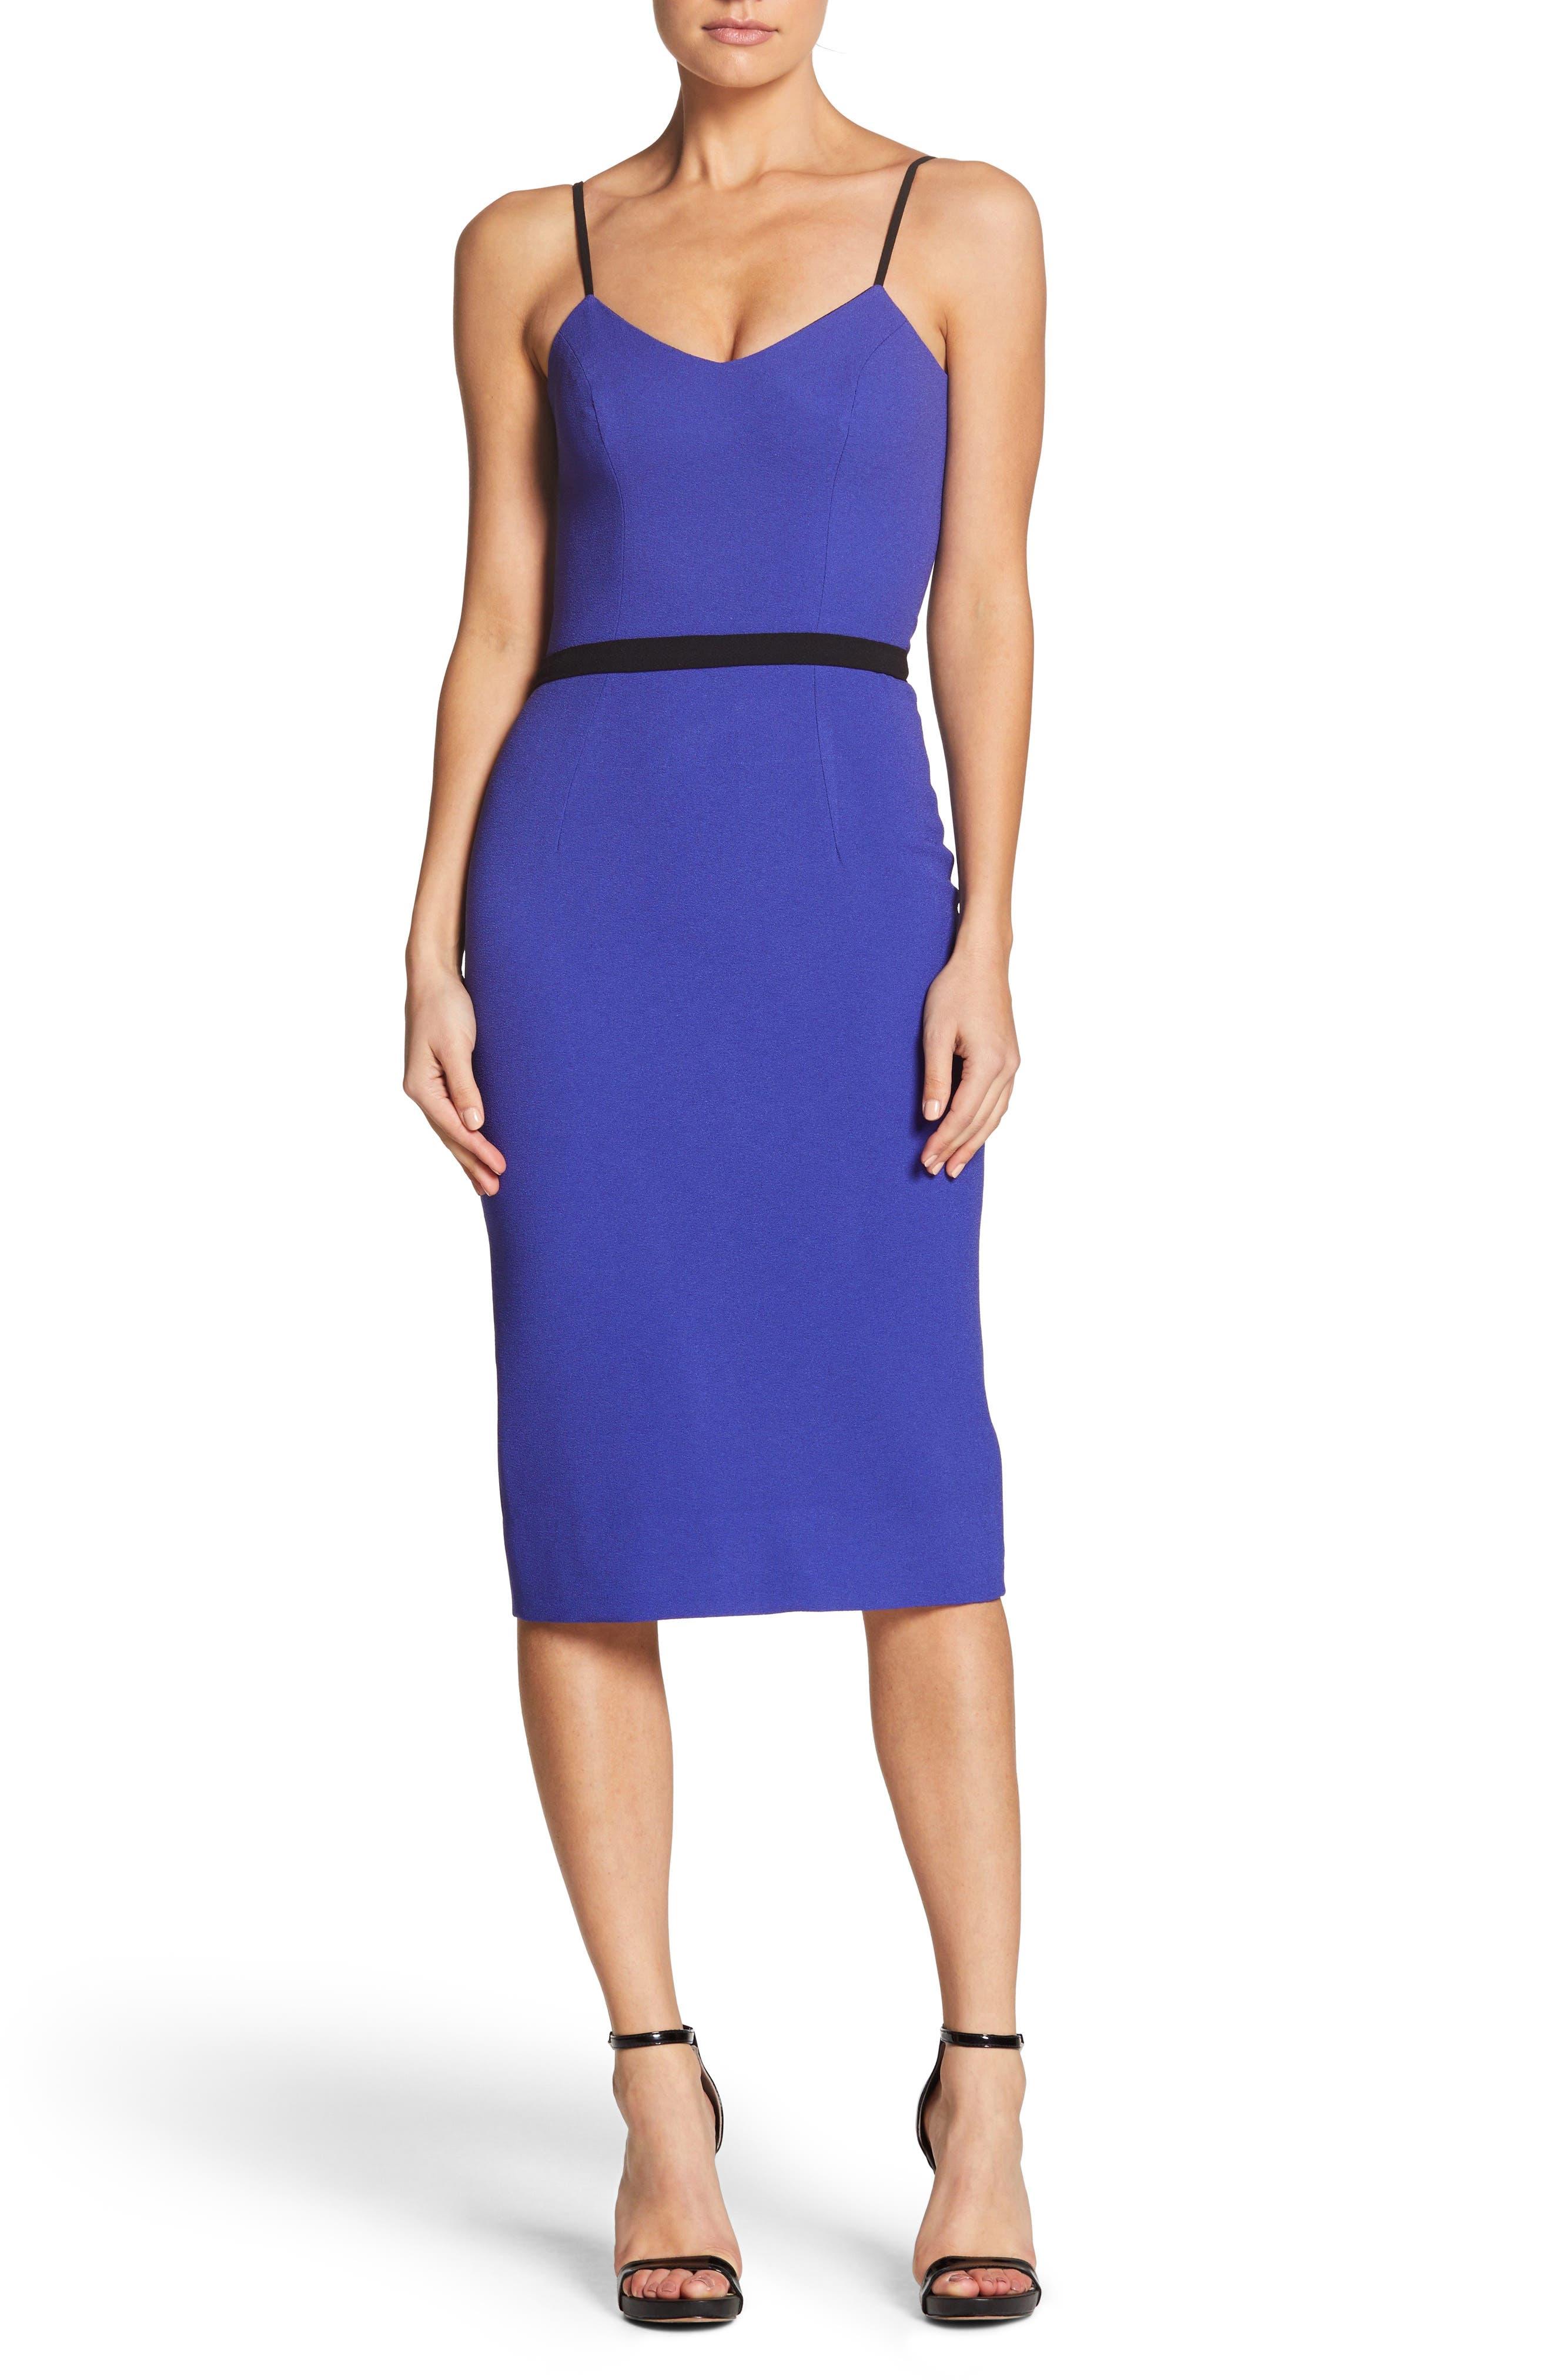 Emma Spaghetti Strap Body-Con Dress,                             Main thumbnail 1, color,                             BLUE/ VIOLET